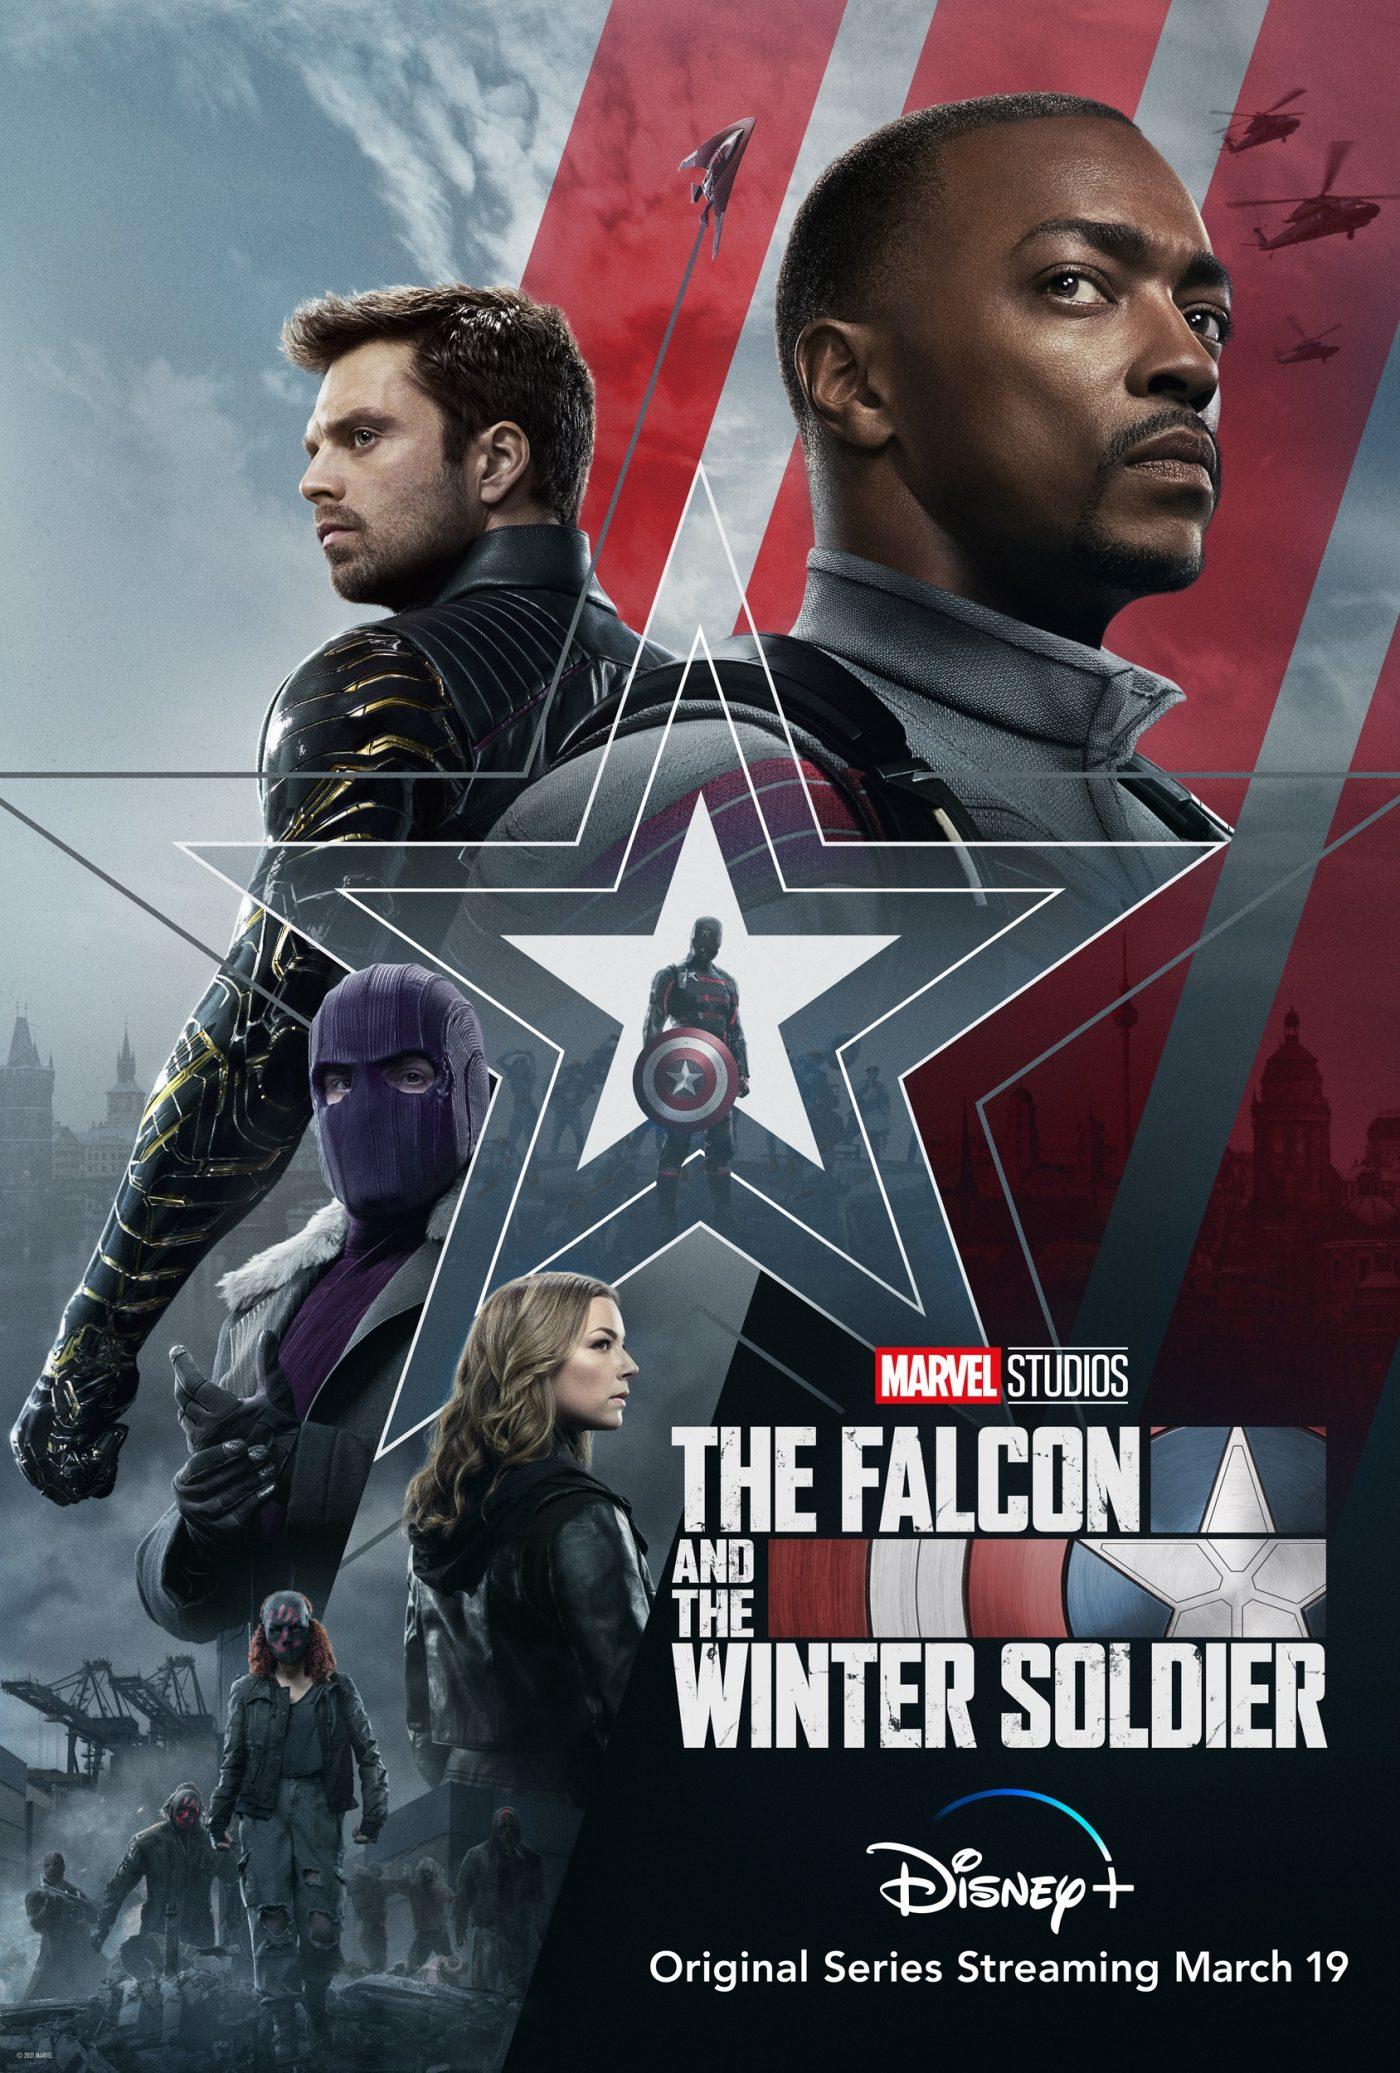 FALCON winter soldier poster